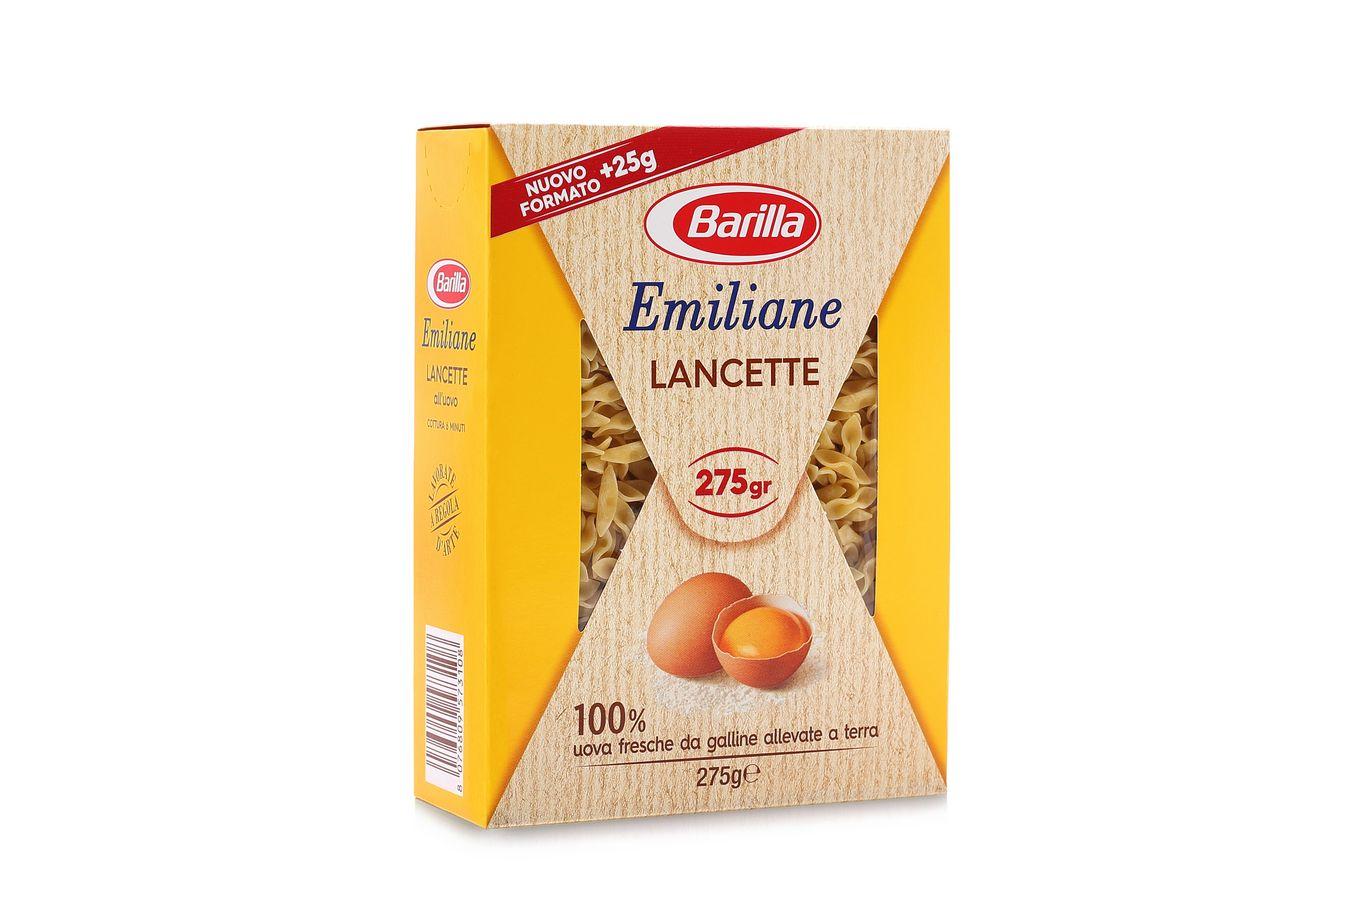 Emiliane Lancette